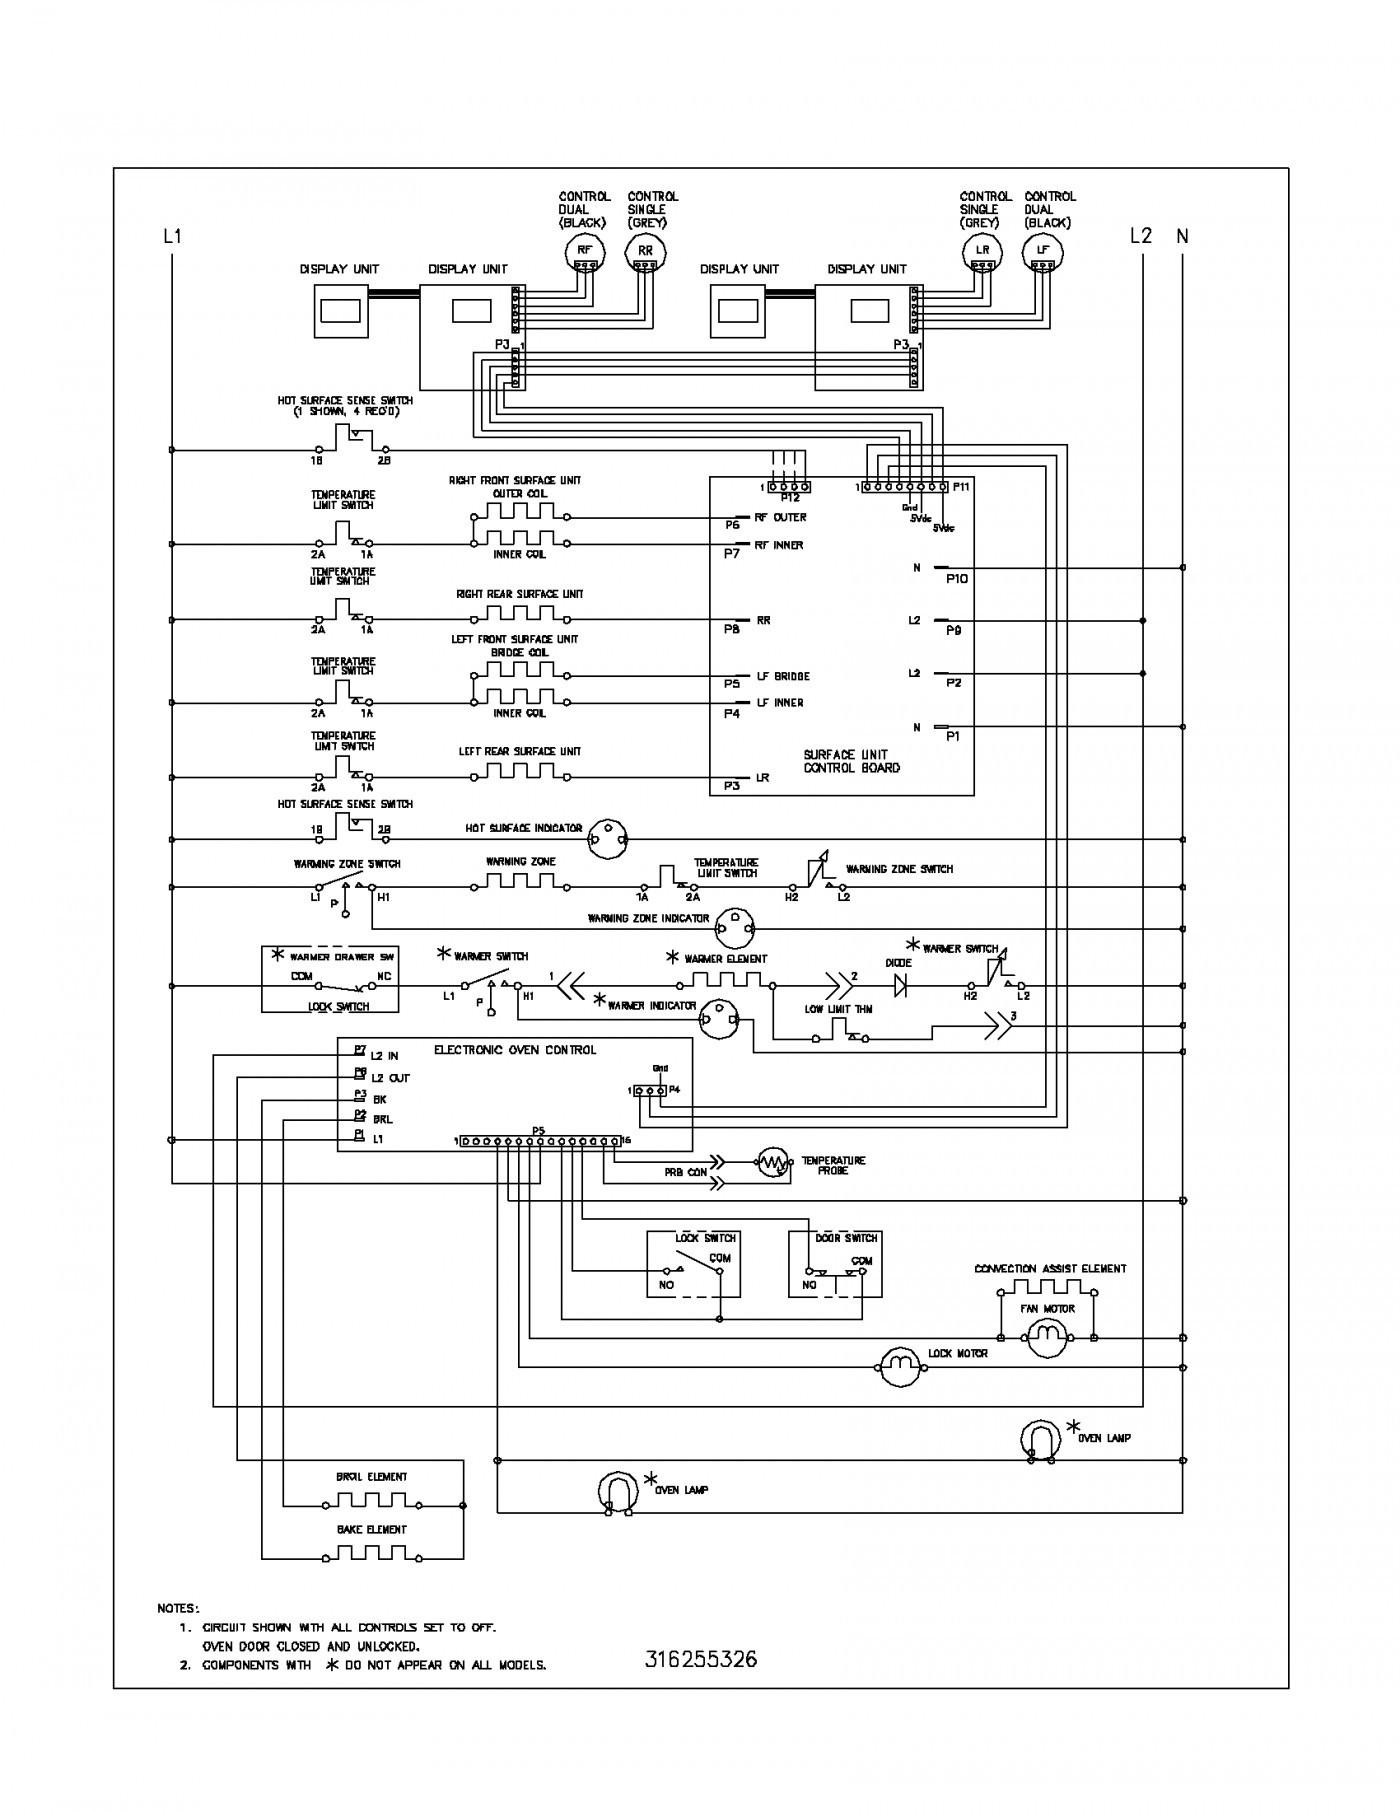 Wiring Diagram For Nordyne Electric Furnace